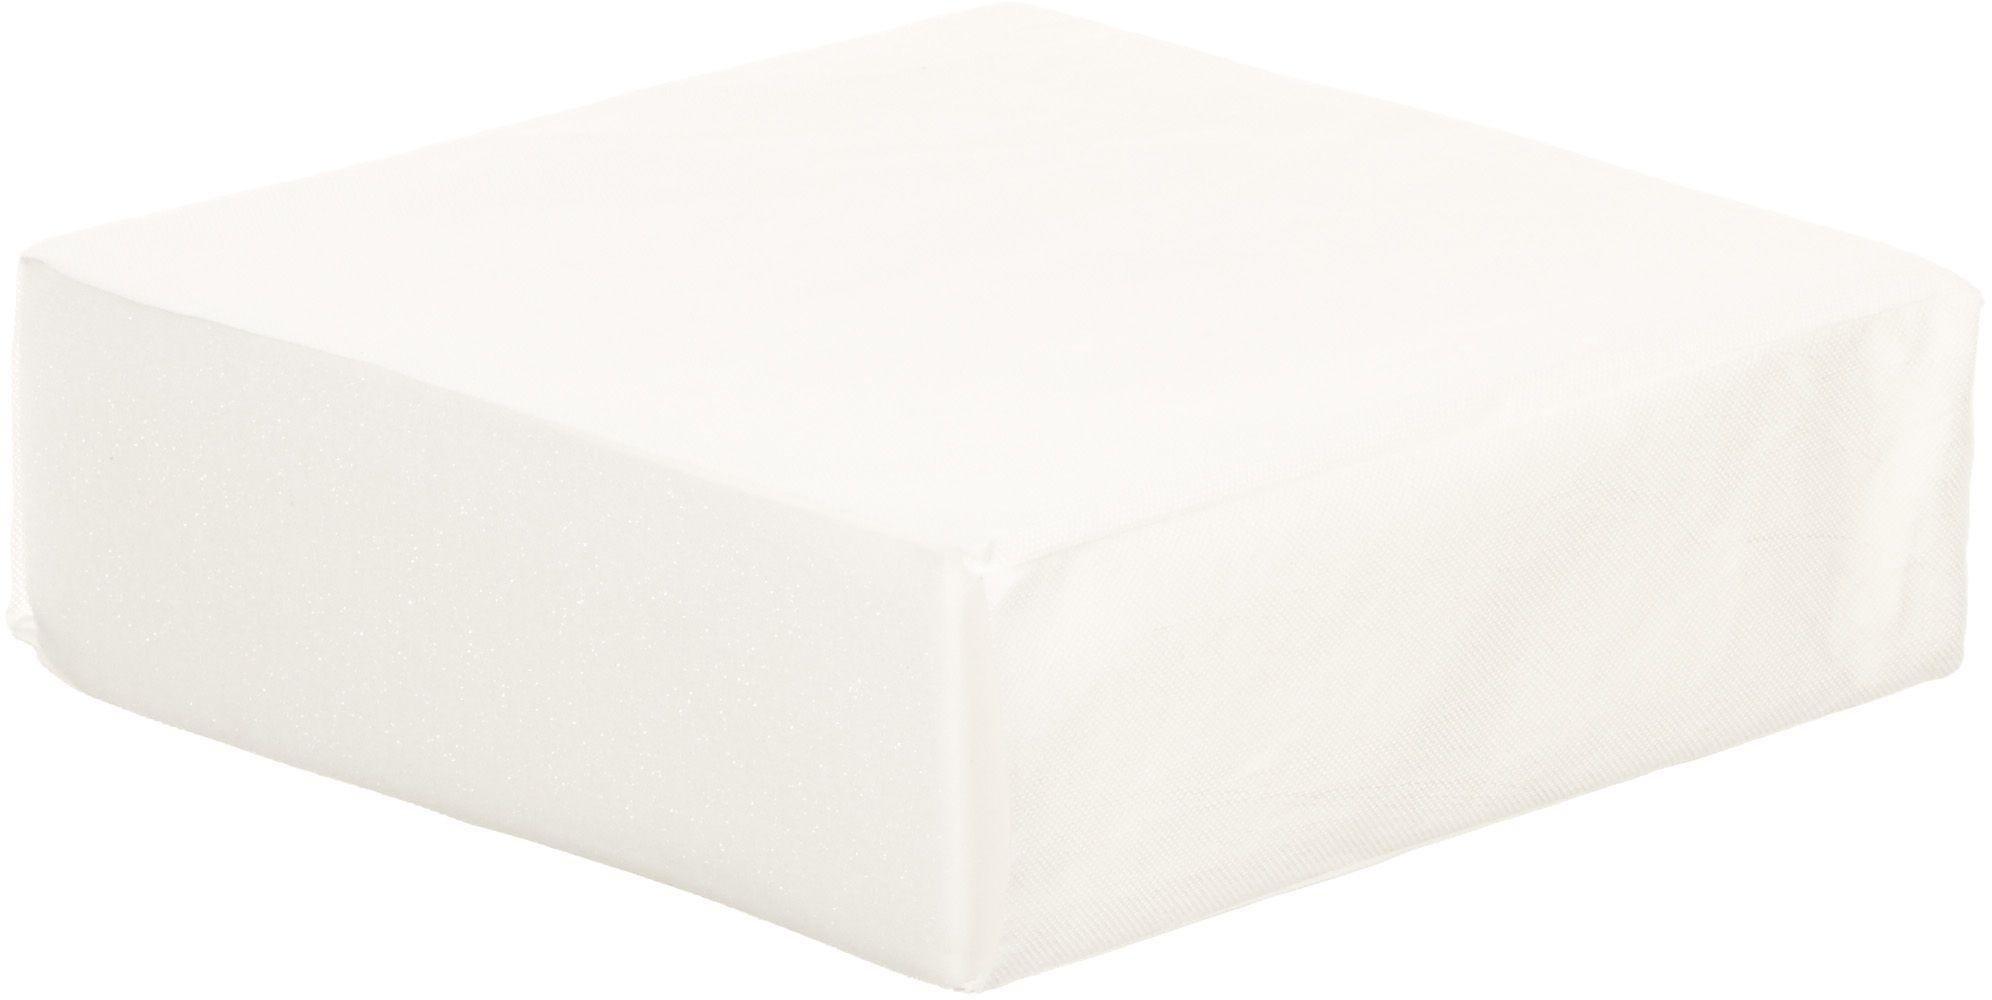 OBaby - 140 x 70cm Foam - Cot - Bed - Mattress